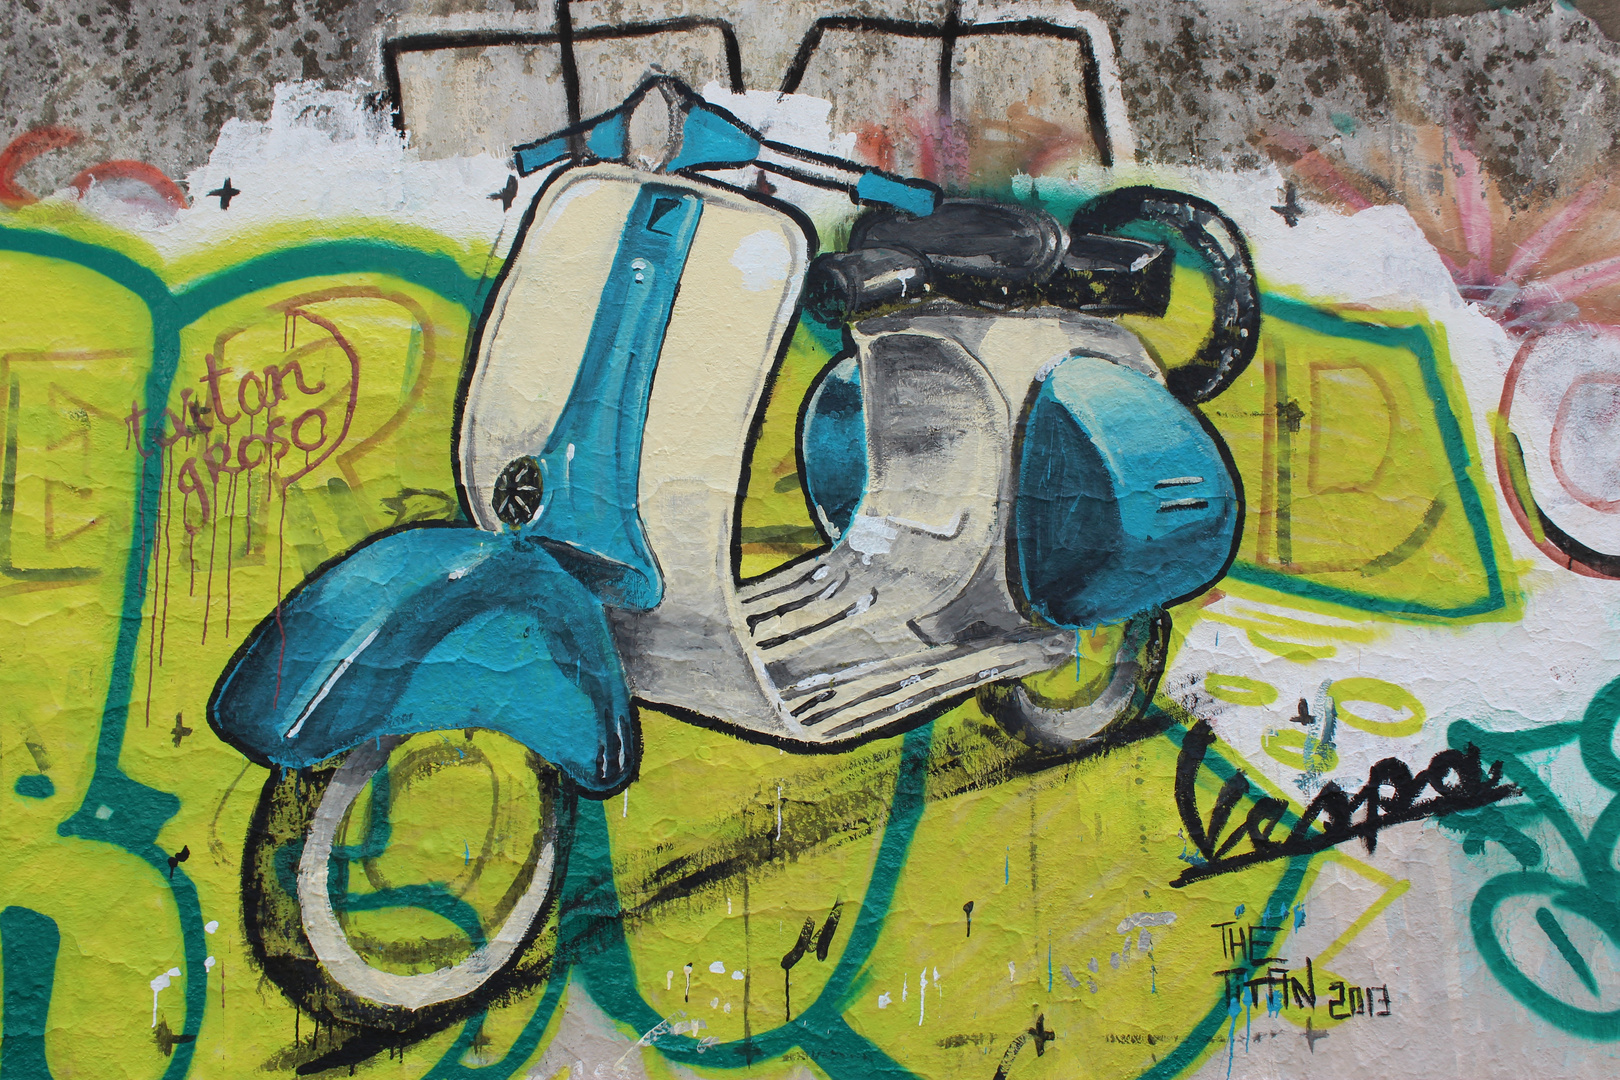 Buenos Aires Street Art - Vespa